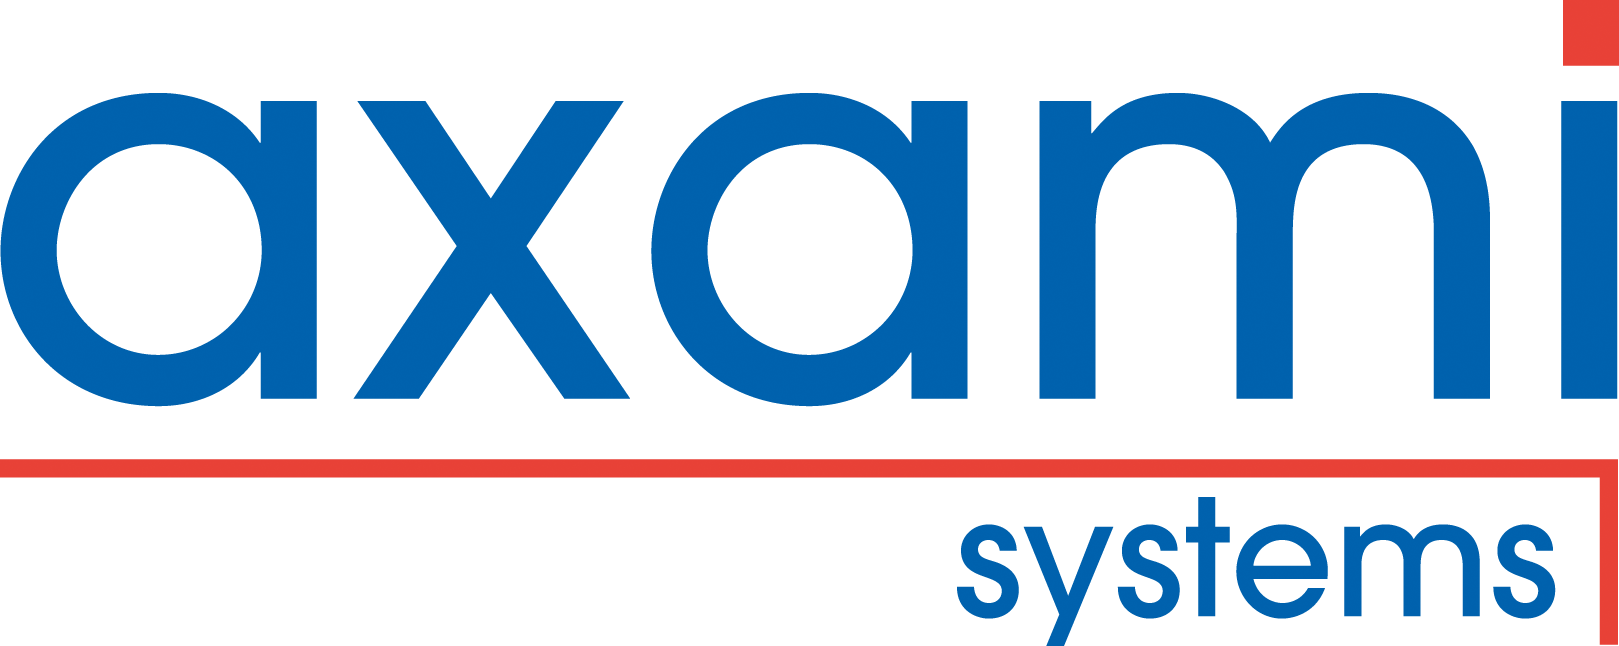 Axami Systems AB - Underhållssystem